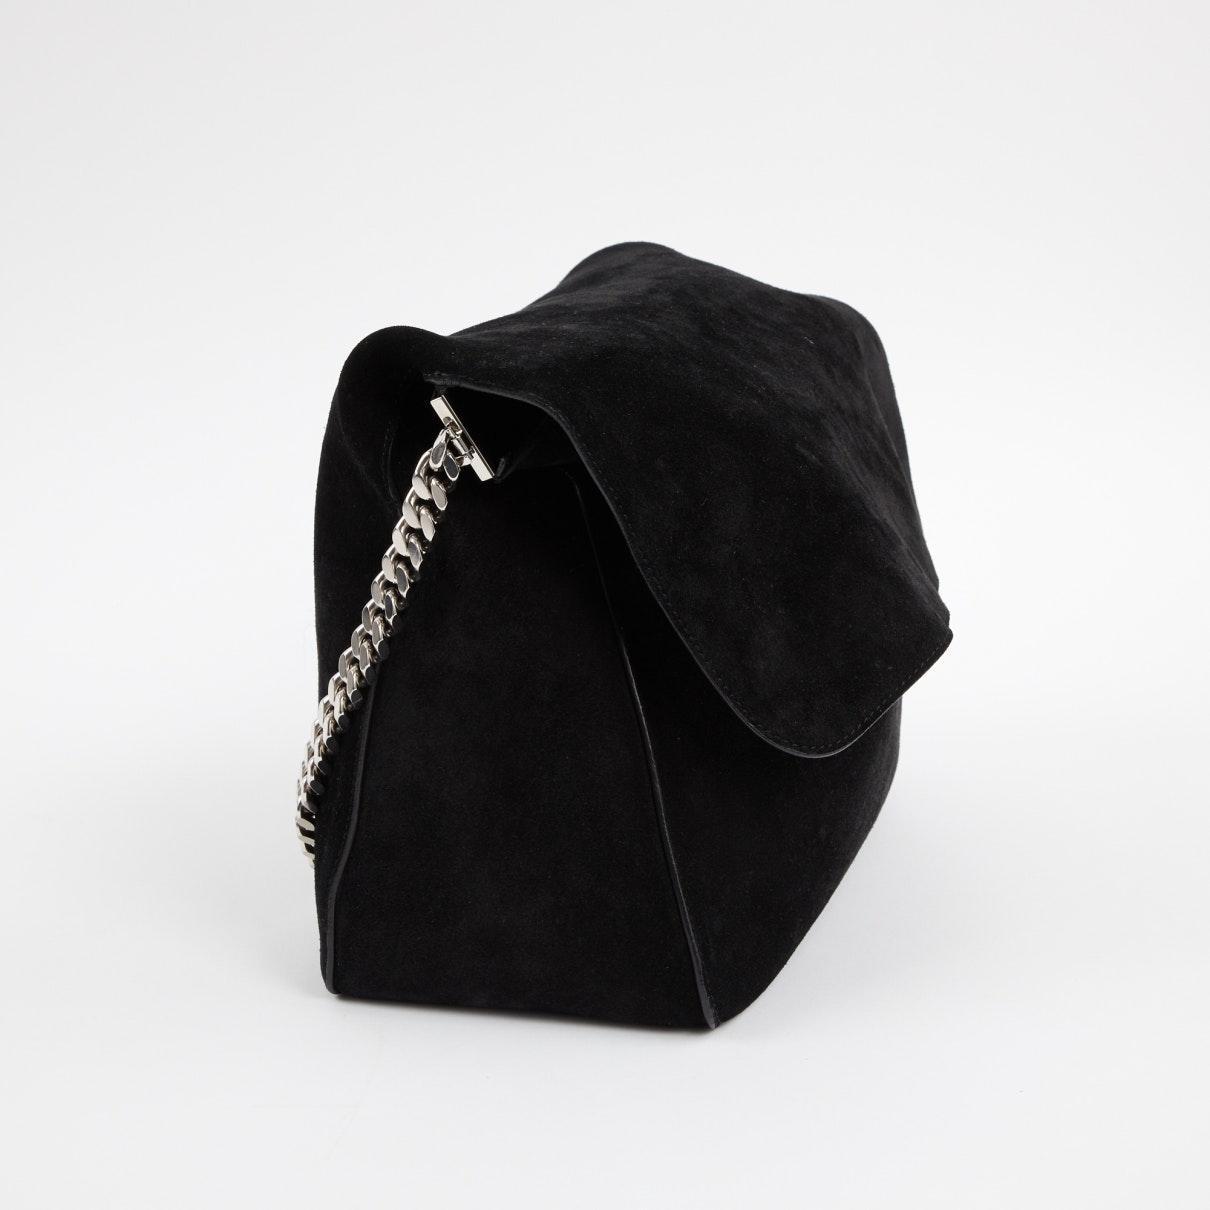 Celine Wildleder Gourmette Handtaschen in Schwarz ibEVN